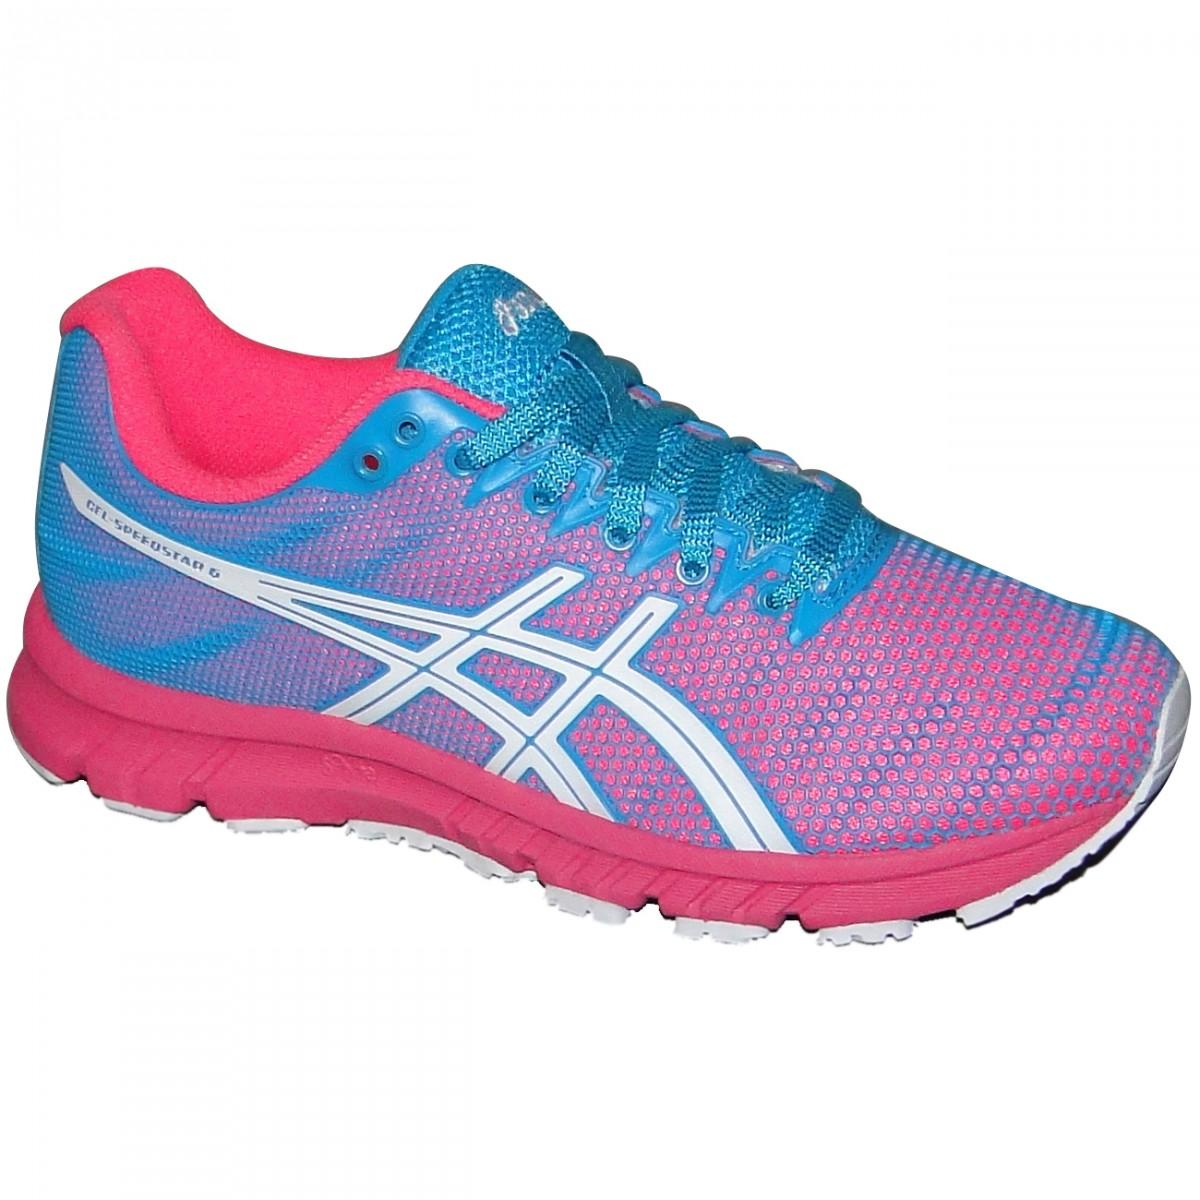 0bdf02e658a Tenis Asics Gel-Speedstar 6 T263N-4601 - Azul Pink Branco - Chuteira Nike